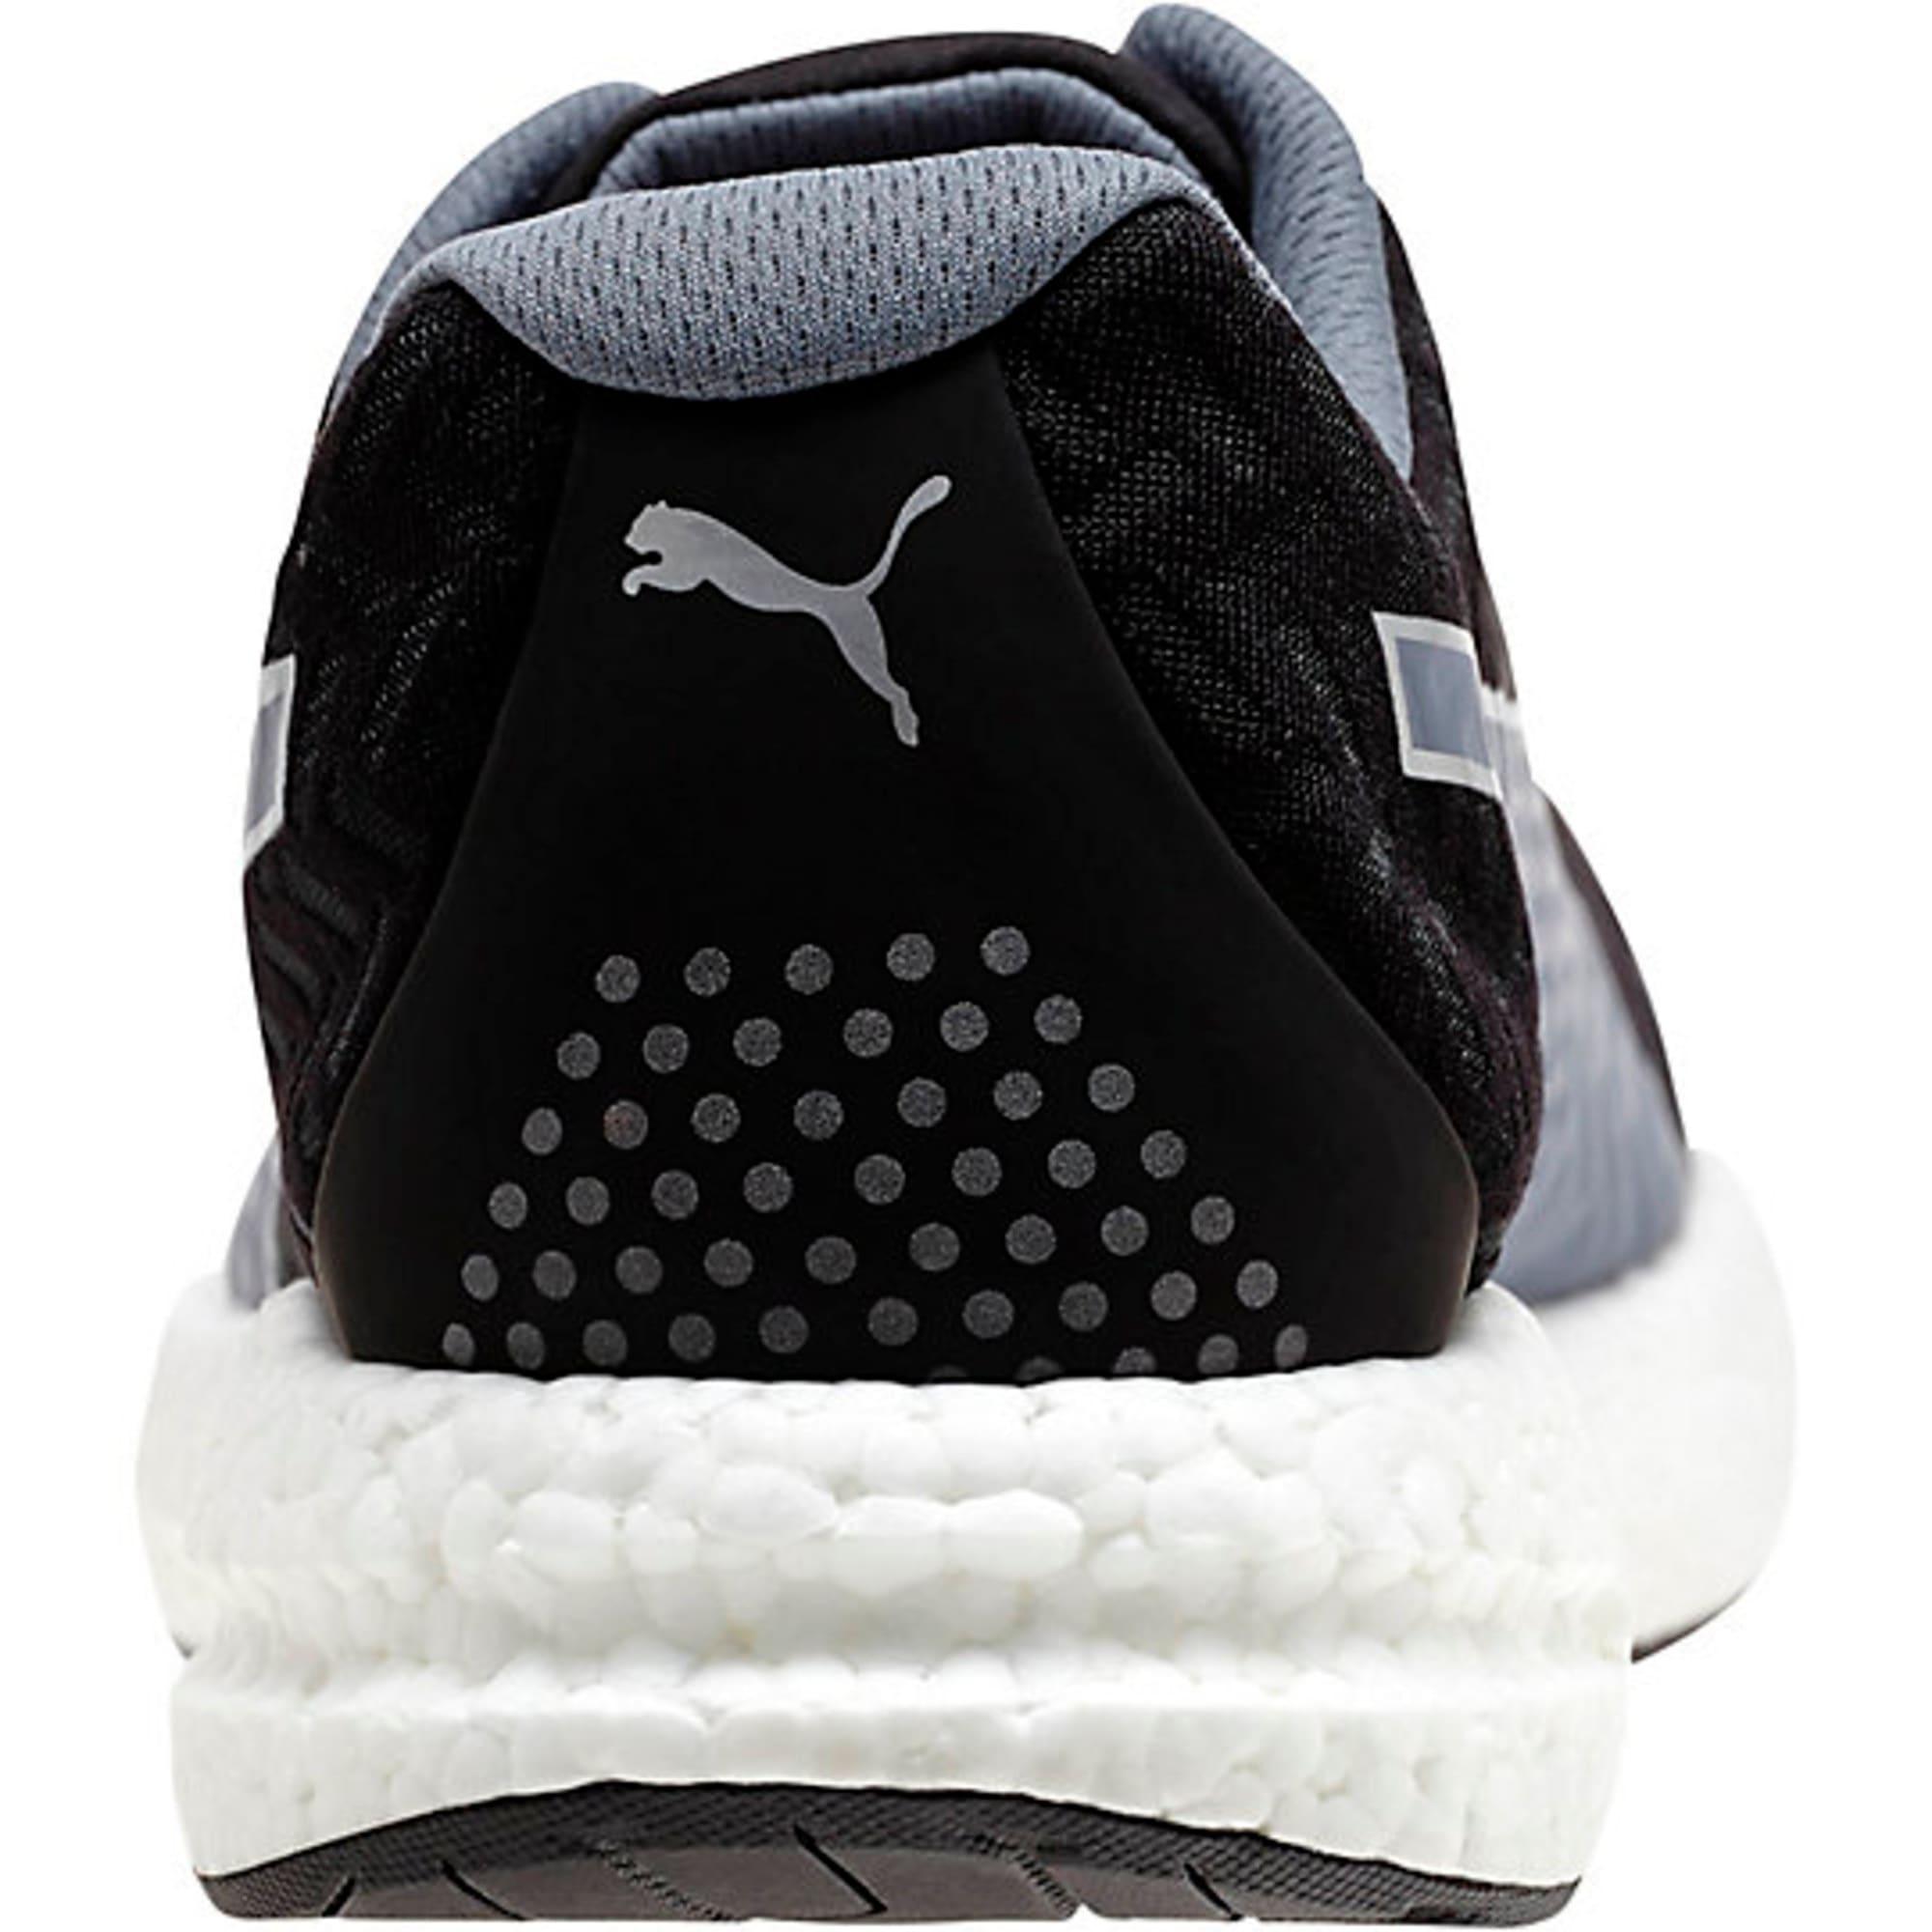 Thumbnail 3 of NRGY Running Shoes, black-folkstone gray, medium-IND